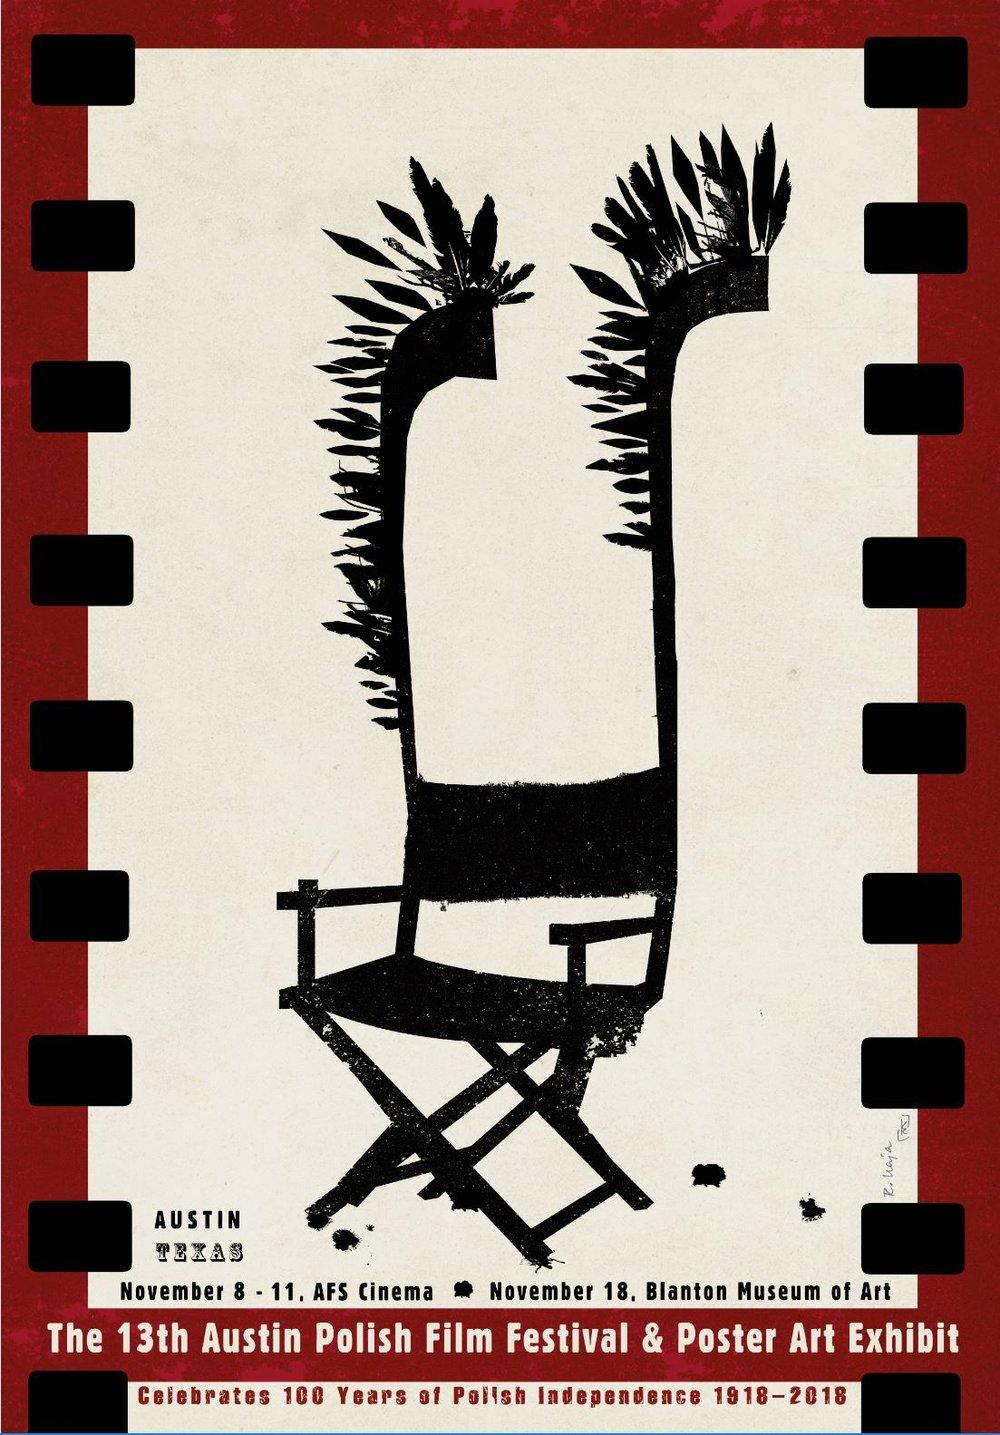 Austin Polish Film Festival Poster Gallery